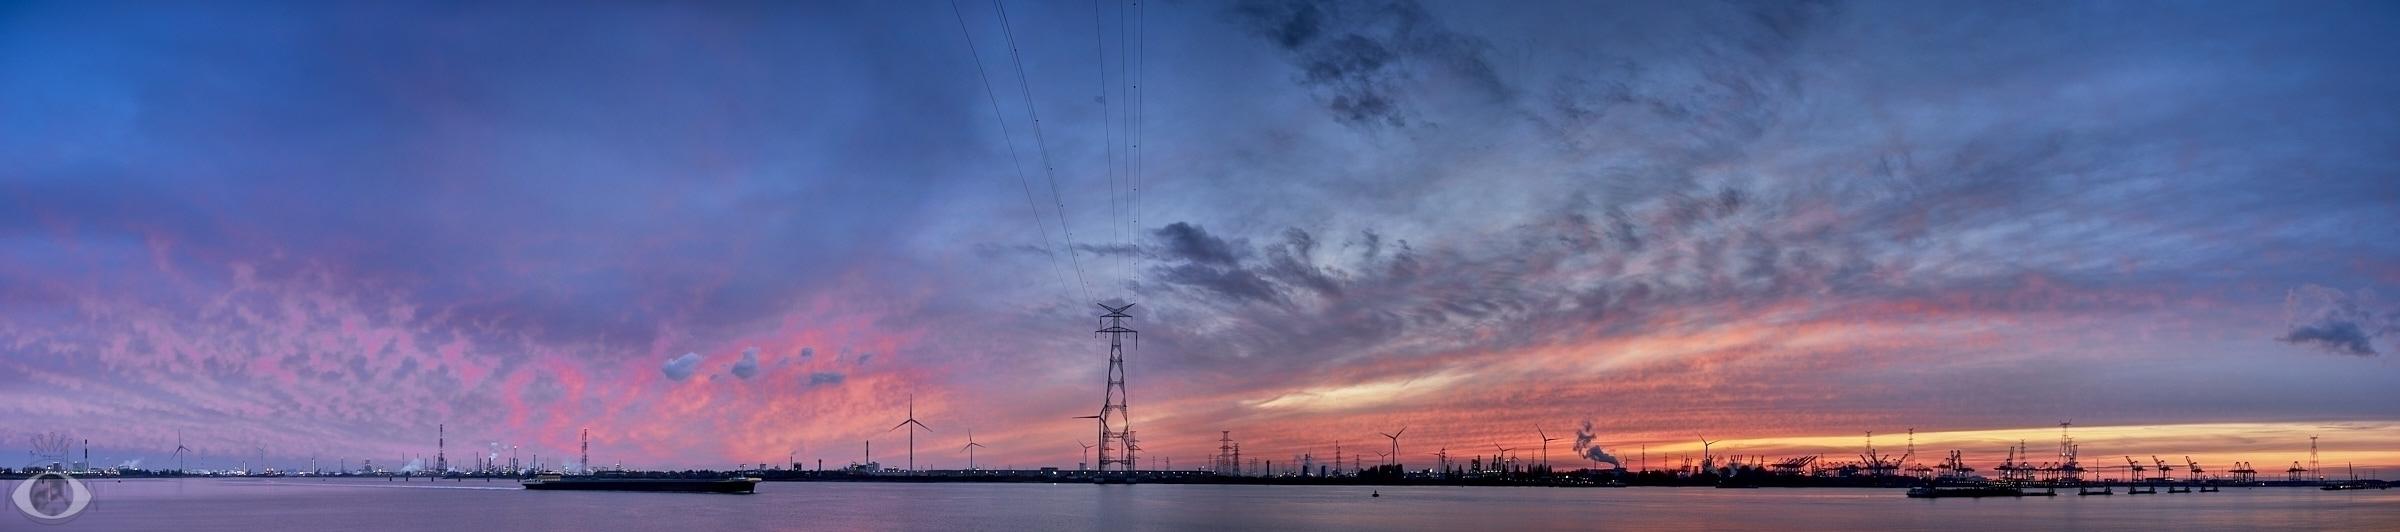 Harbour Sunset. home detour imm - pentaxke | ello